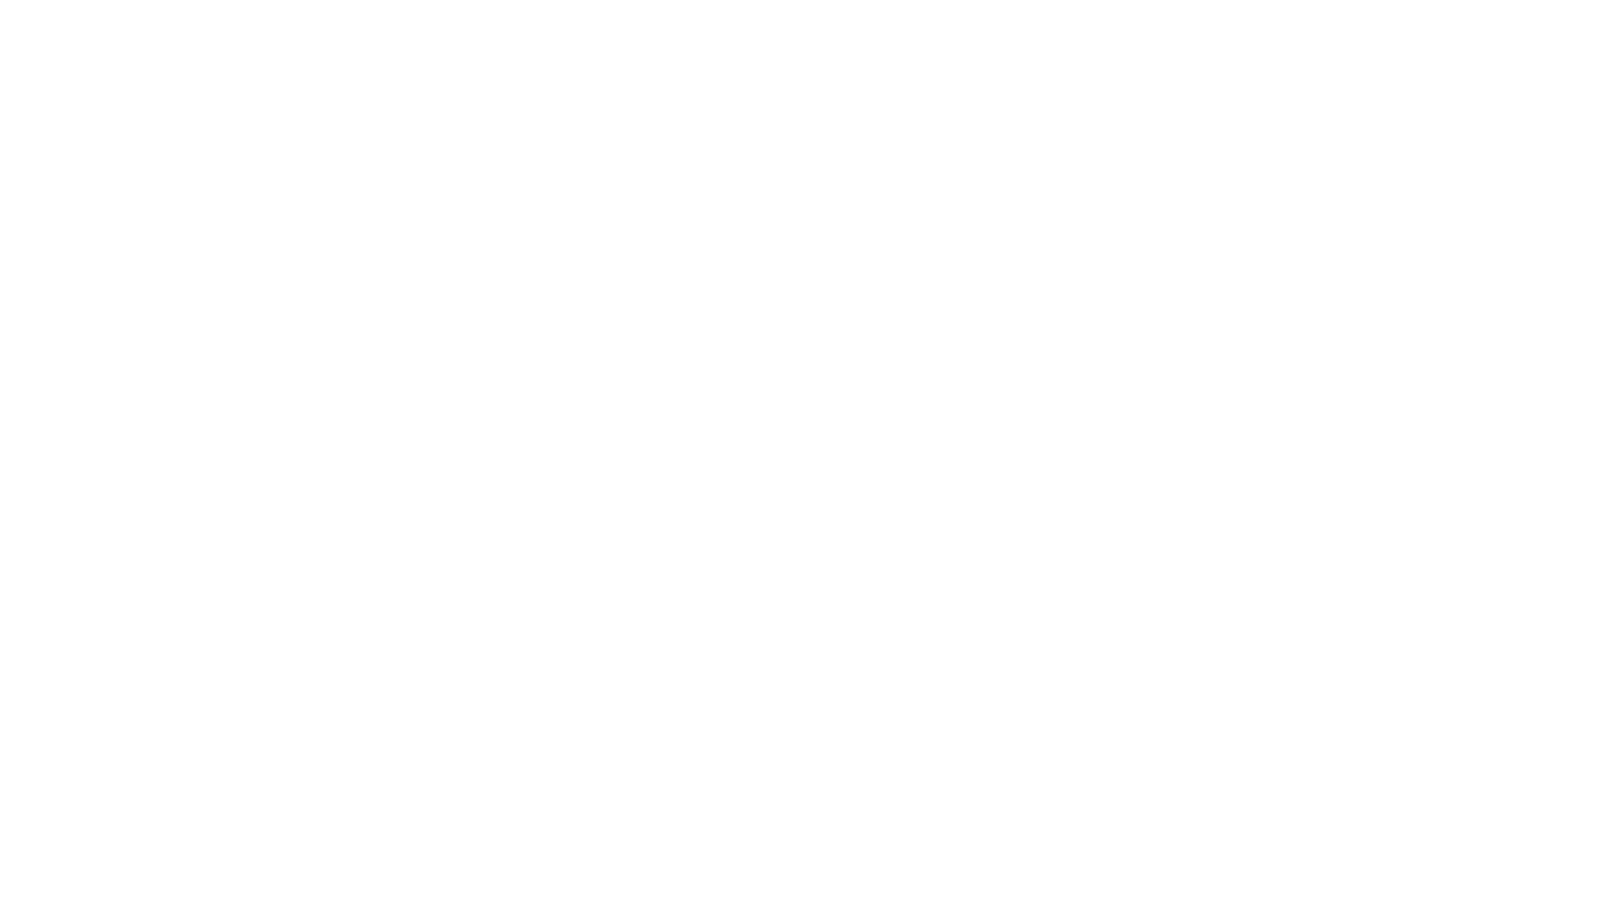 作品: 機動戰士鋼彈W 曲名: Just Communication (Piano Version) 演奏者: Ru  Ru  FB: https://www.facebook.com/ruruspiano IG: https://www.instagram.com/ruruspiano  XOVR 跨界塗鴉:  官方網站: http://www.xovr.me   Facebook: http://www.facebook.com/xovrology/ Instagram: http://www.instagram.com/xovrology/    Disclaimer*   XOVR跨界塗鴉並非此音樂作品的原創與擁有方,也並無任何將其用於營利的行為,純粹為推廣動漫等二次元文化之用。  XOVR do not own, create or monetize from this music piece, but only use to help introduce ACG culture to the world.